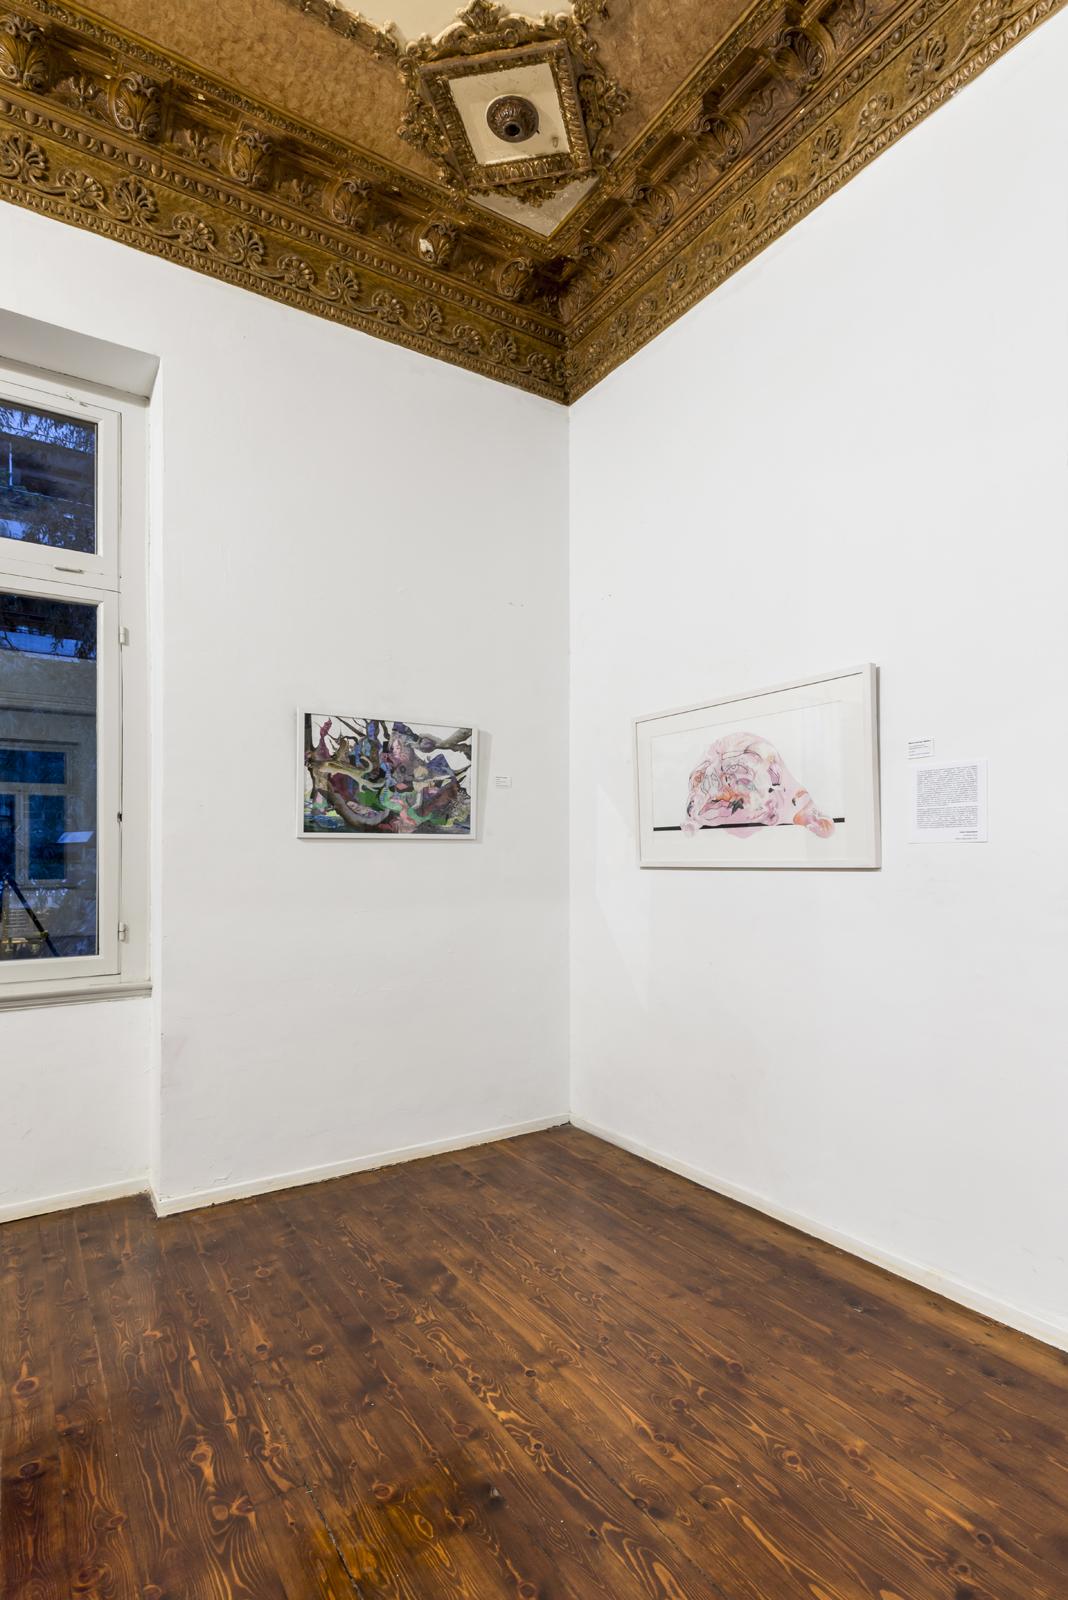 Roundcube architectural photography,  maria mavropoulou,  φωτογράφιση εκθέσεων, φωτογράφιση εσωτερικών χώρων, φωτογράφιση έργων τέχνης, Μαρία Μαυροπούλου,  αρχιτεκτονική φωτογραφία, Trii Art Hub Koukaki, Κουκάκι